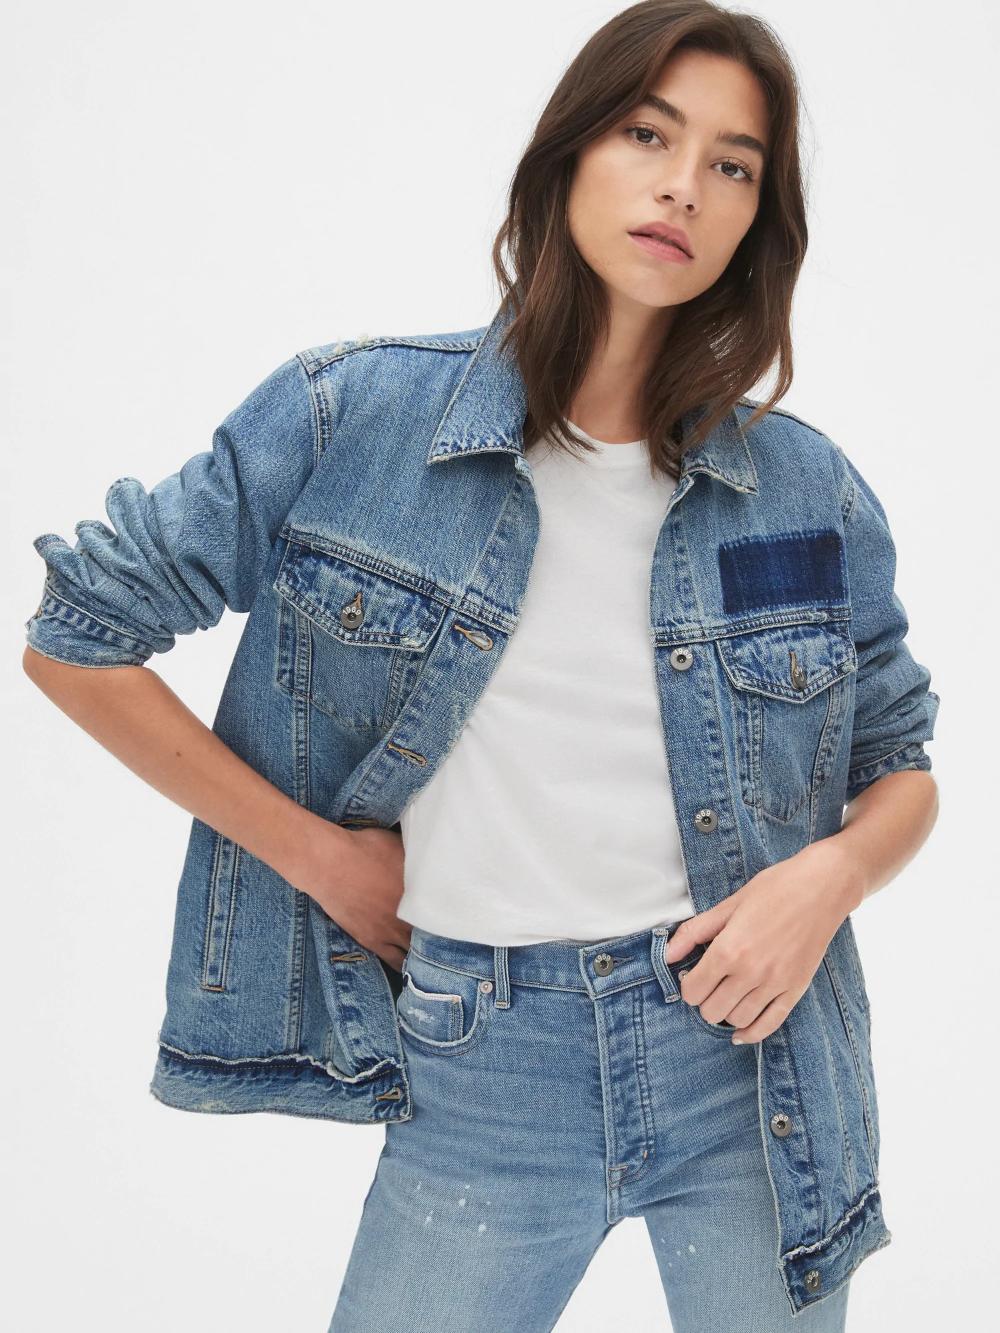 Oversized Icon Denim Jacket Gap Coats Jackets Women Denim Jacket Stylish Outerwear [ 1333 x 1000 Pixel ]